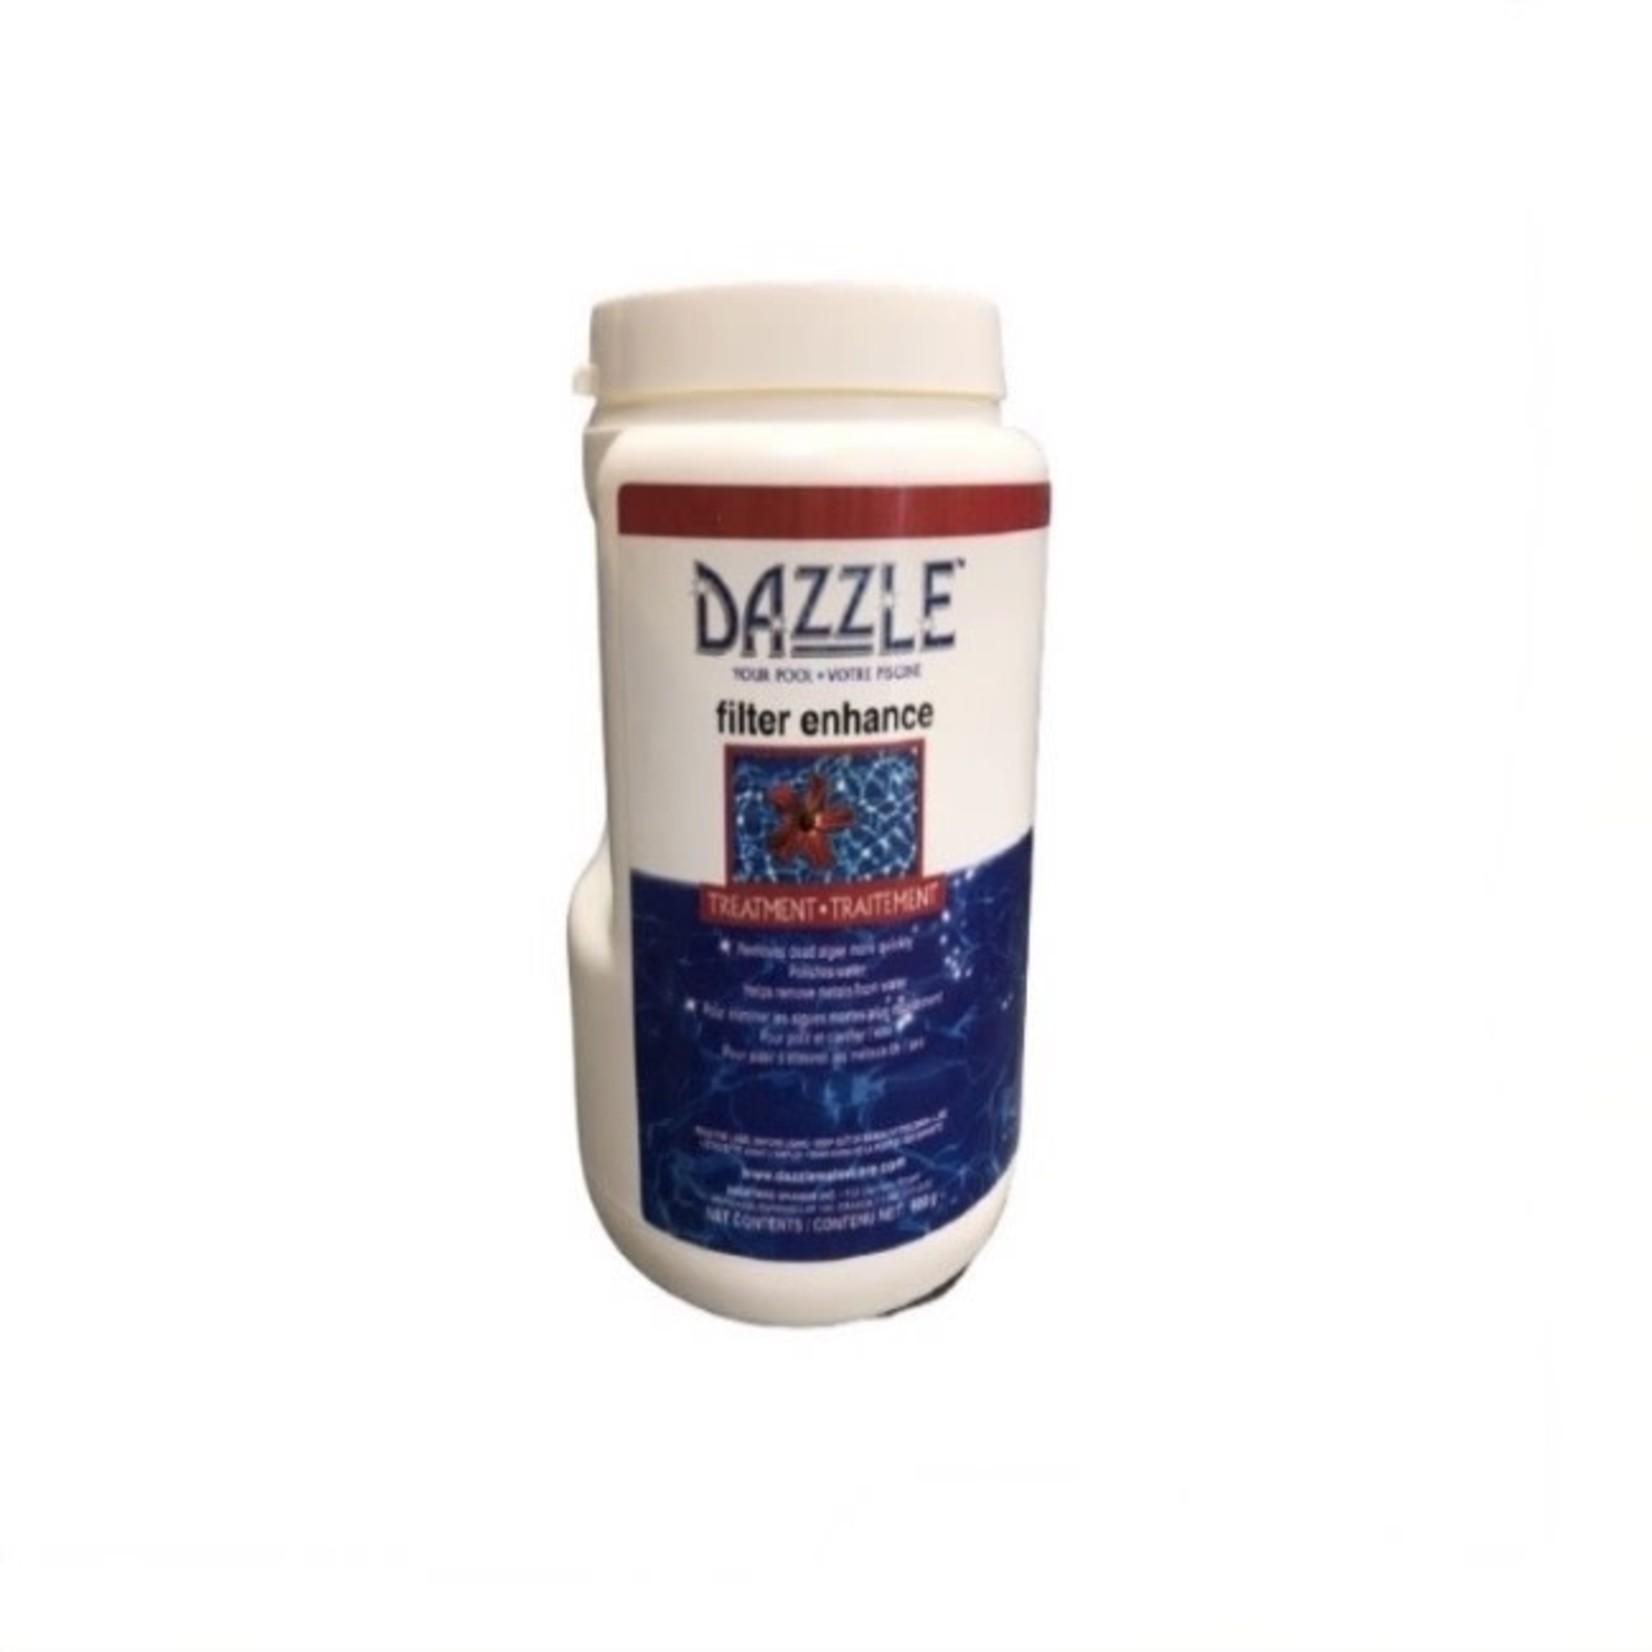 Dazzle DAZZLE FILTER ENHANCE 600G